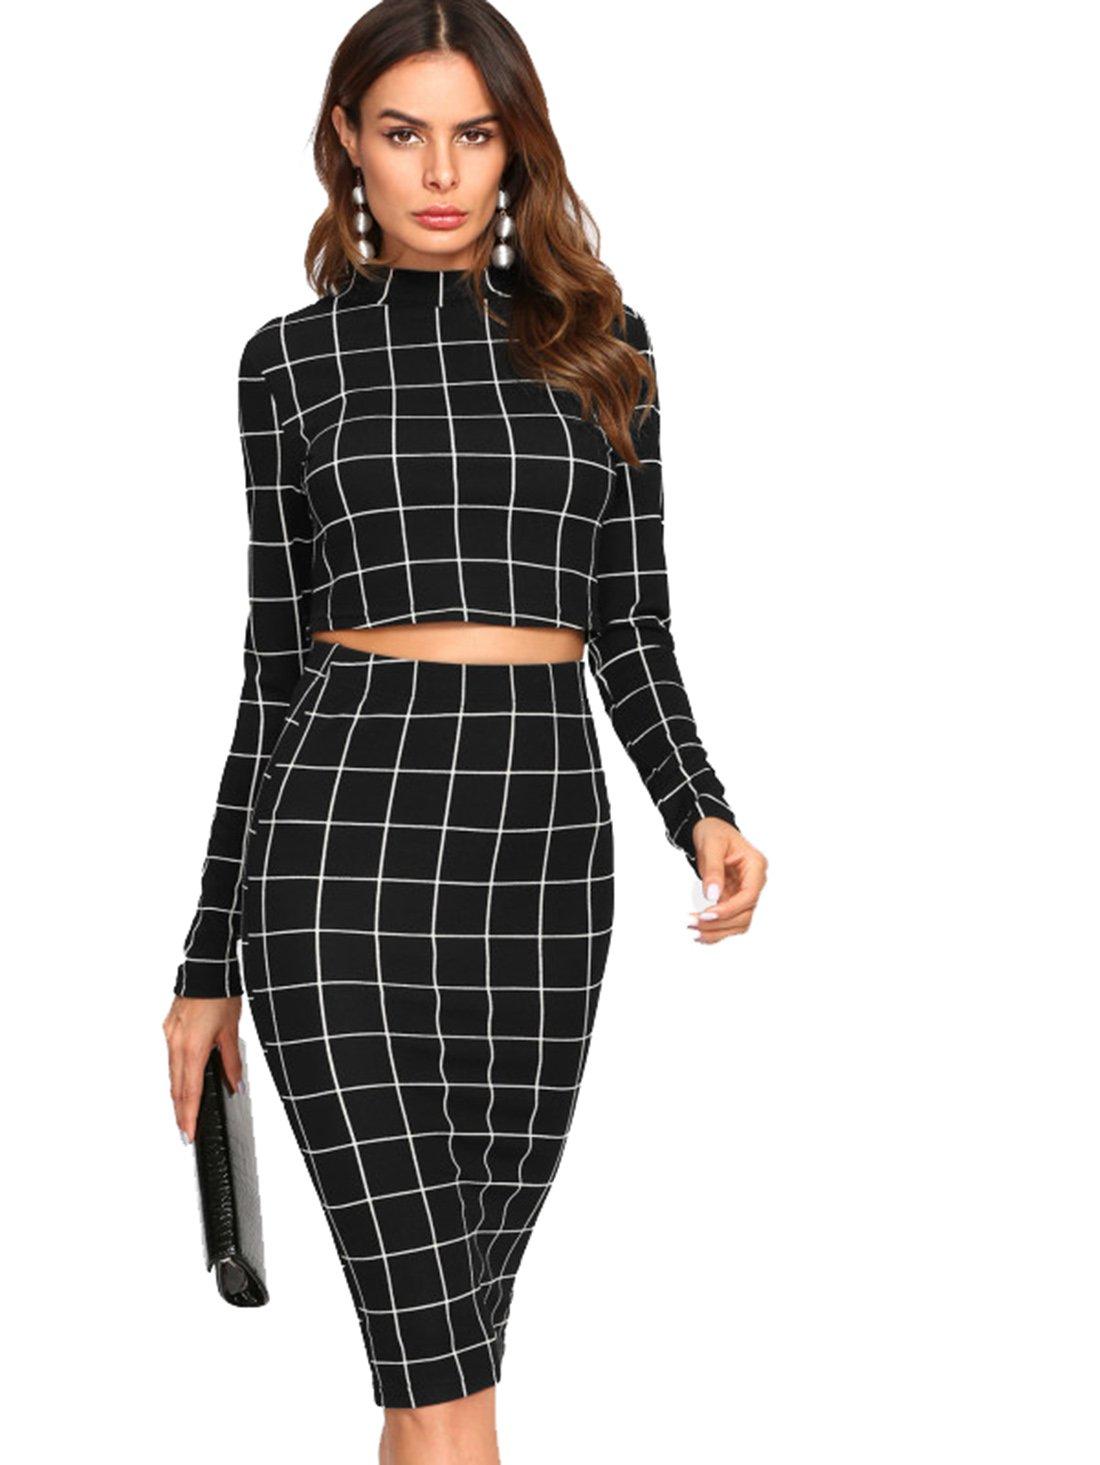 MakeMeChic Women's Long Sleeve Crop Top Bodycon Midi Skirt 2 Piece Set